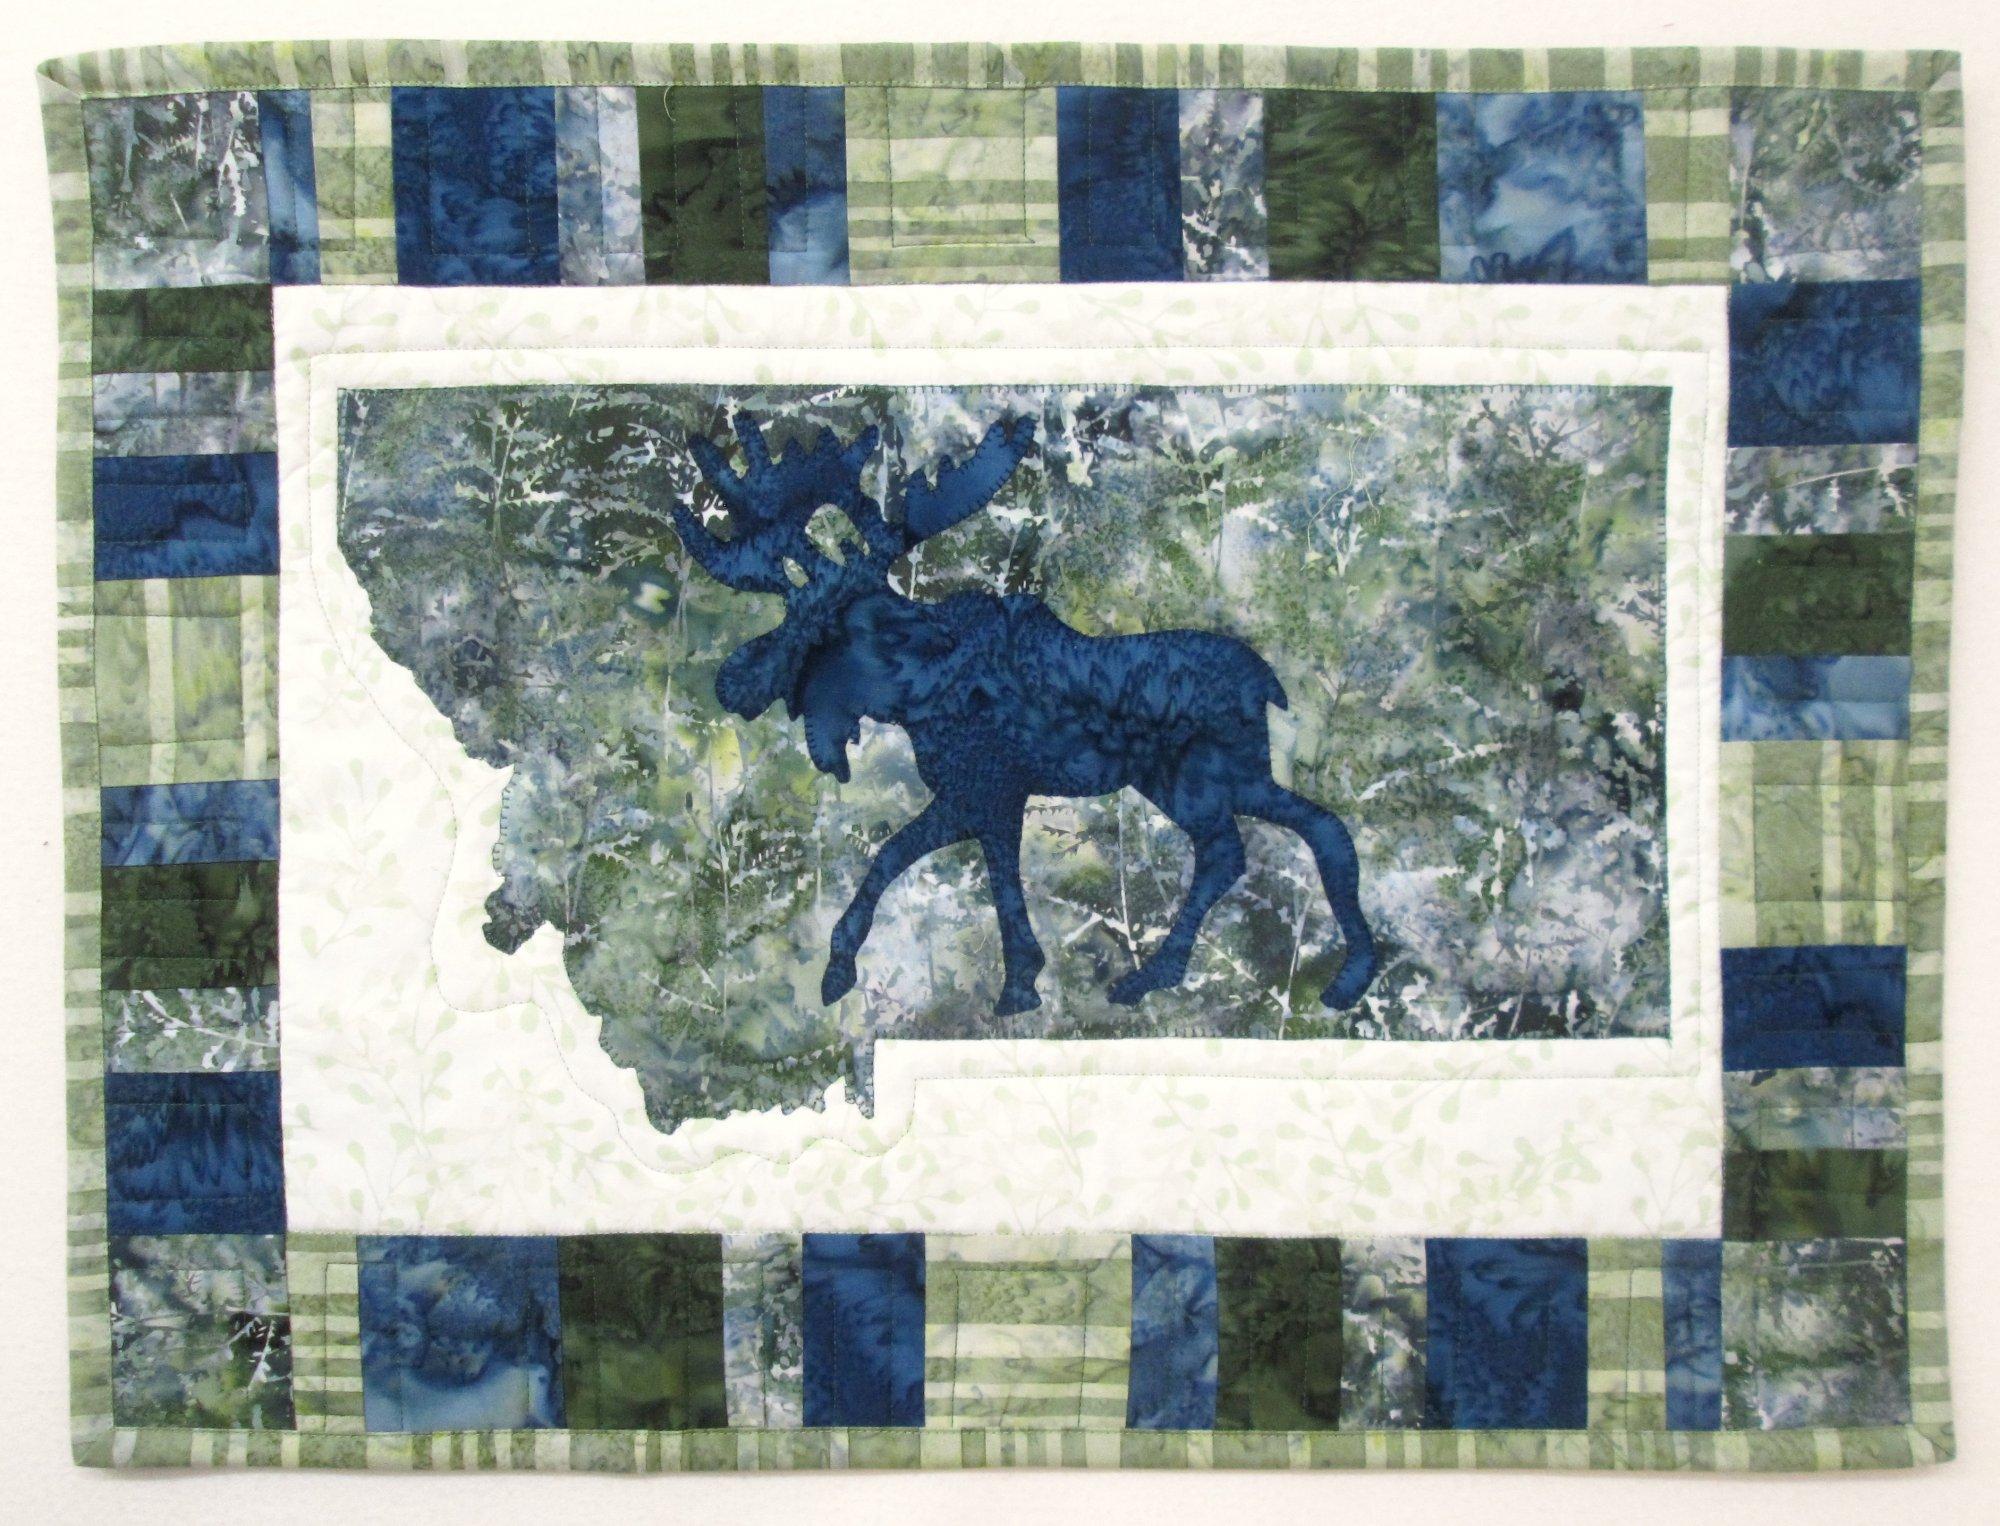 Montana My Heart My Home Moose Wall Hanging Kit (green & blue)